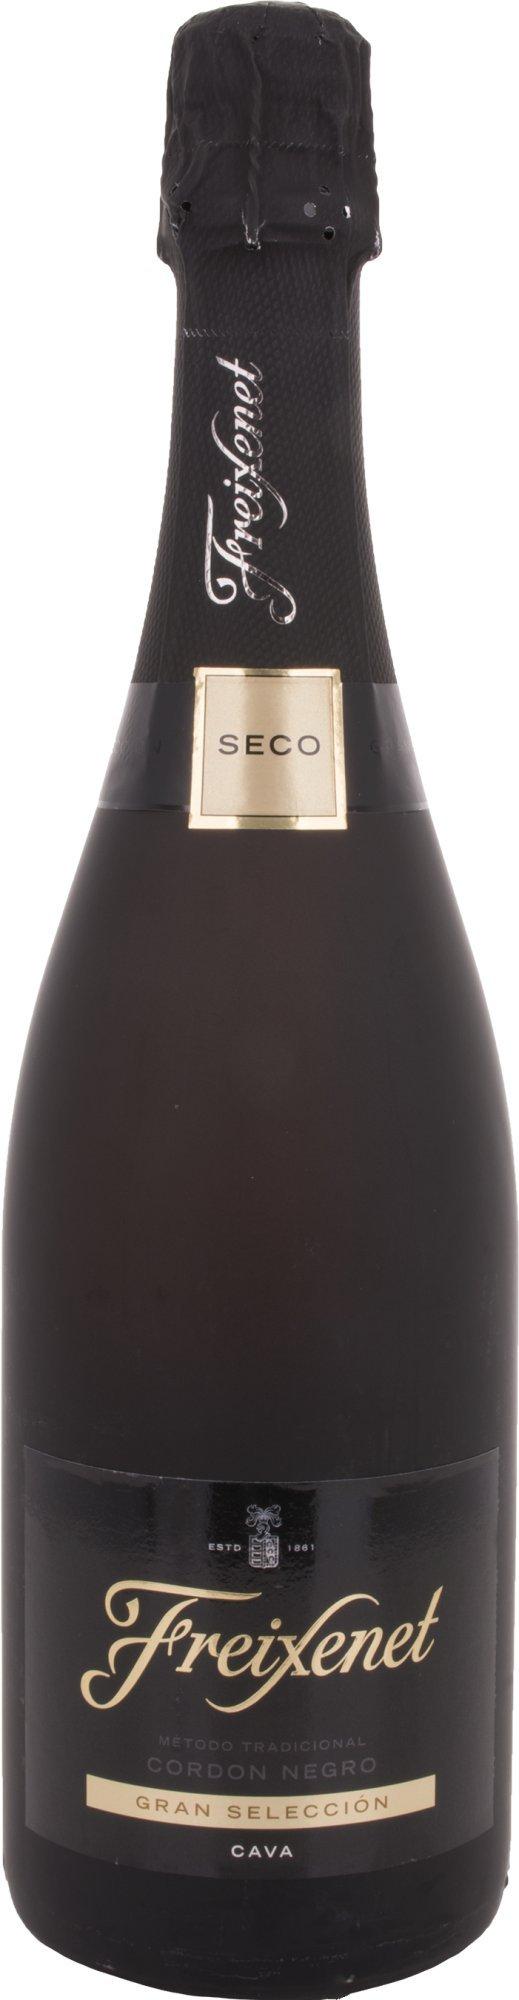 Freixenet-Cordon-Negro-Seco-1-x-075-l